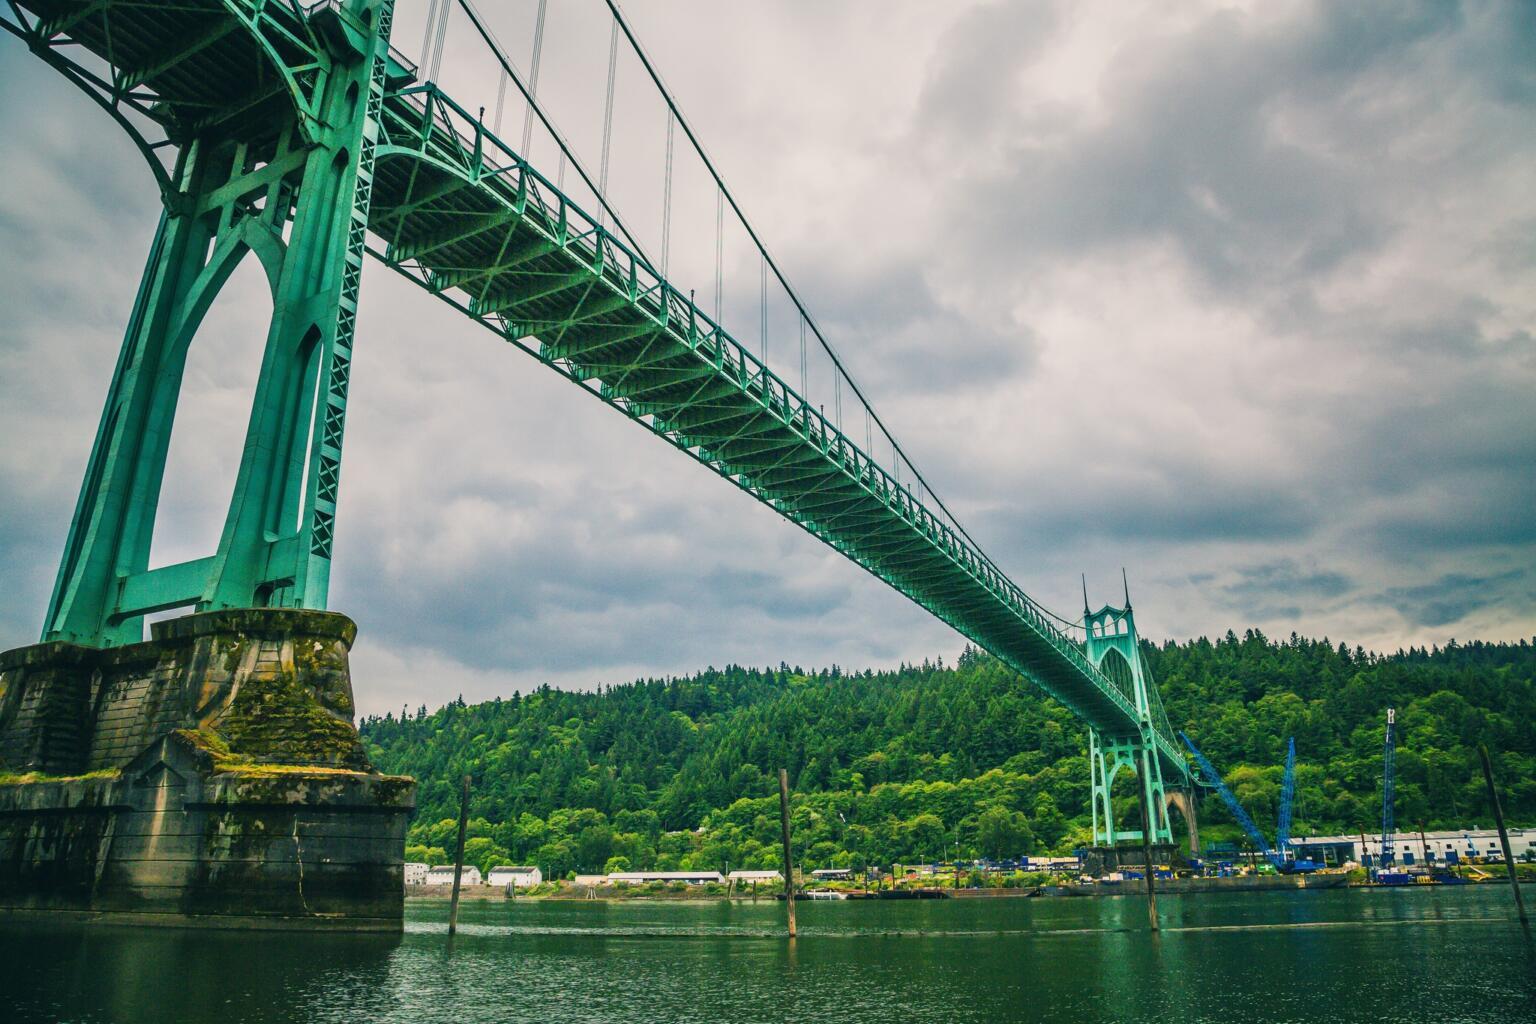 st johns bridge portland oregon travel guide